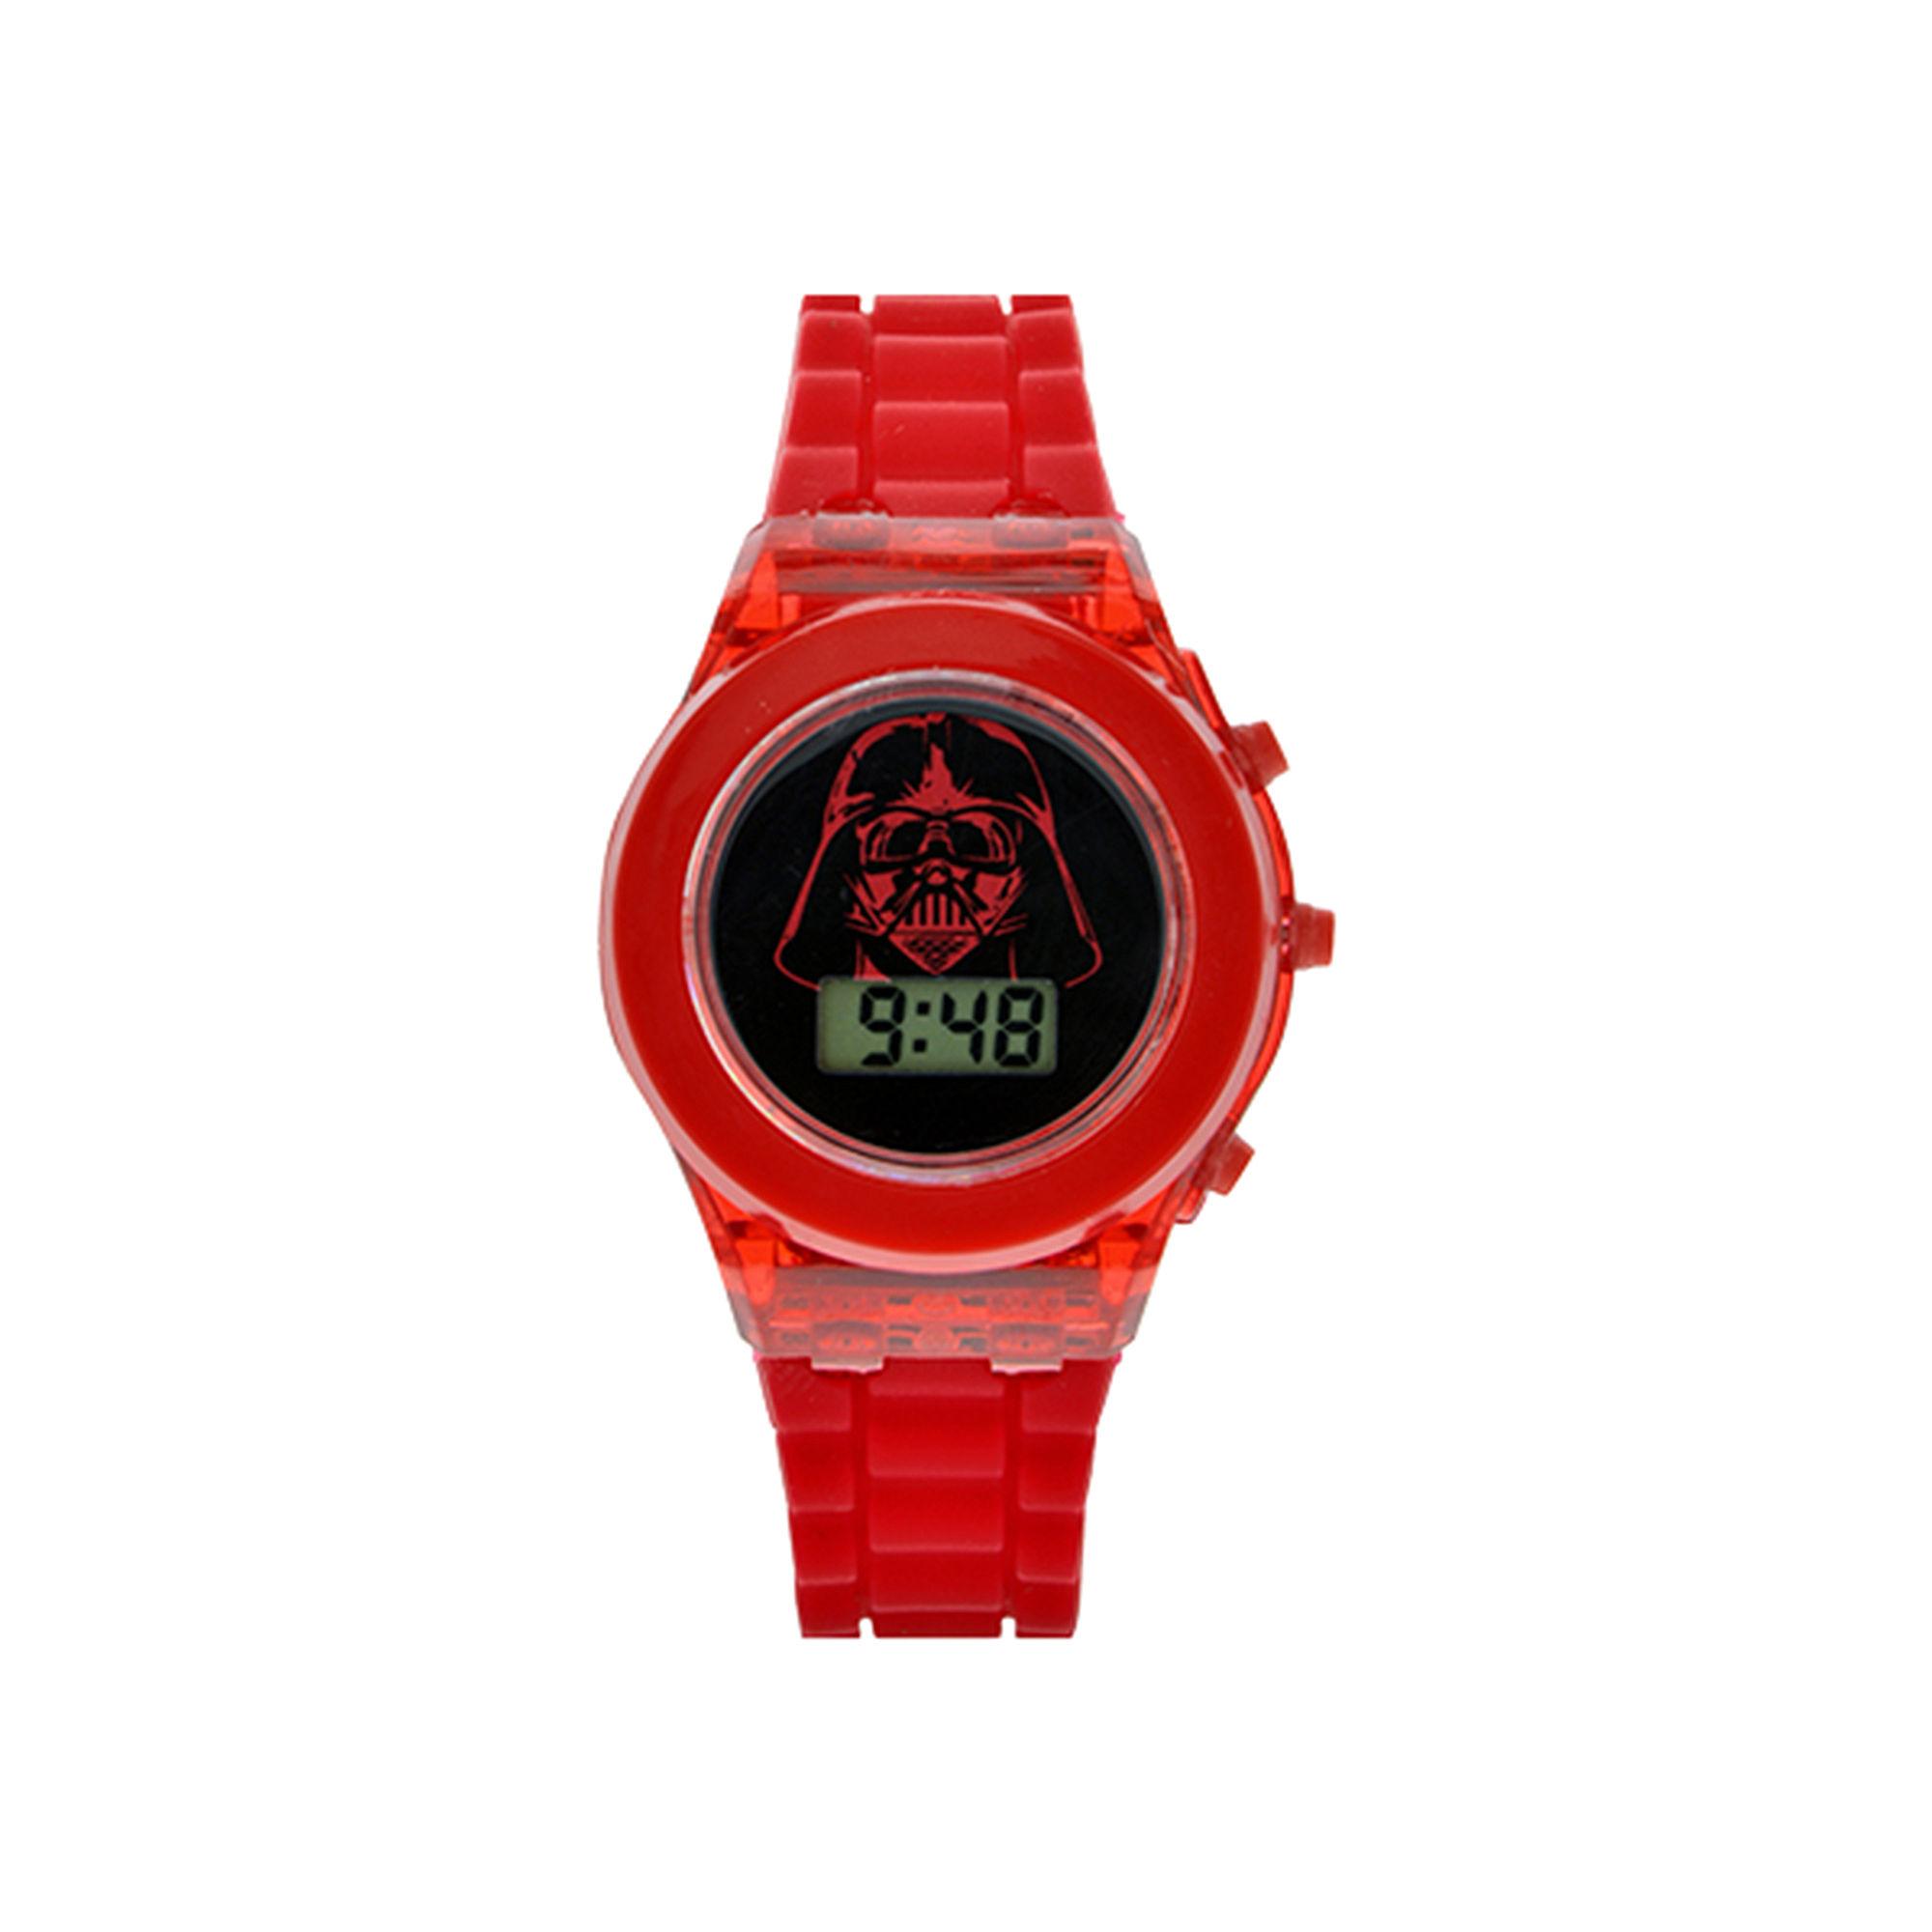 Star Wars Darth Vader Kids Red Silicone Strap Flashing LCD Digital Watch